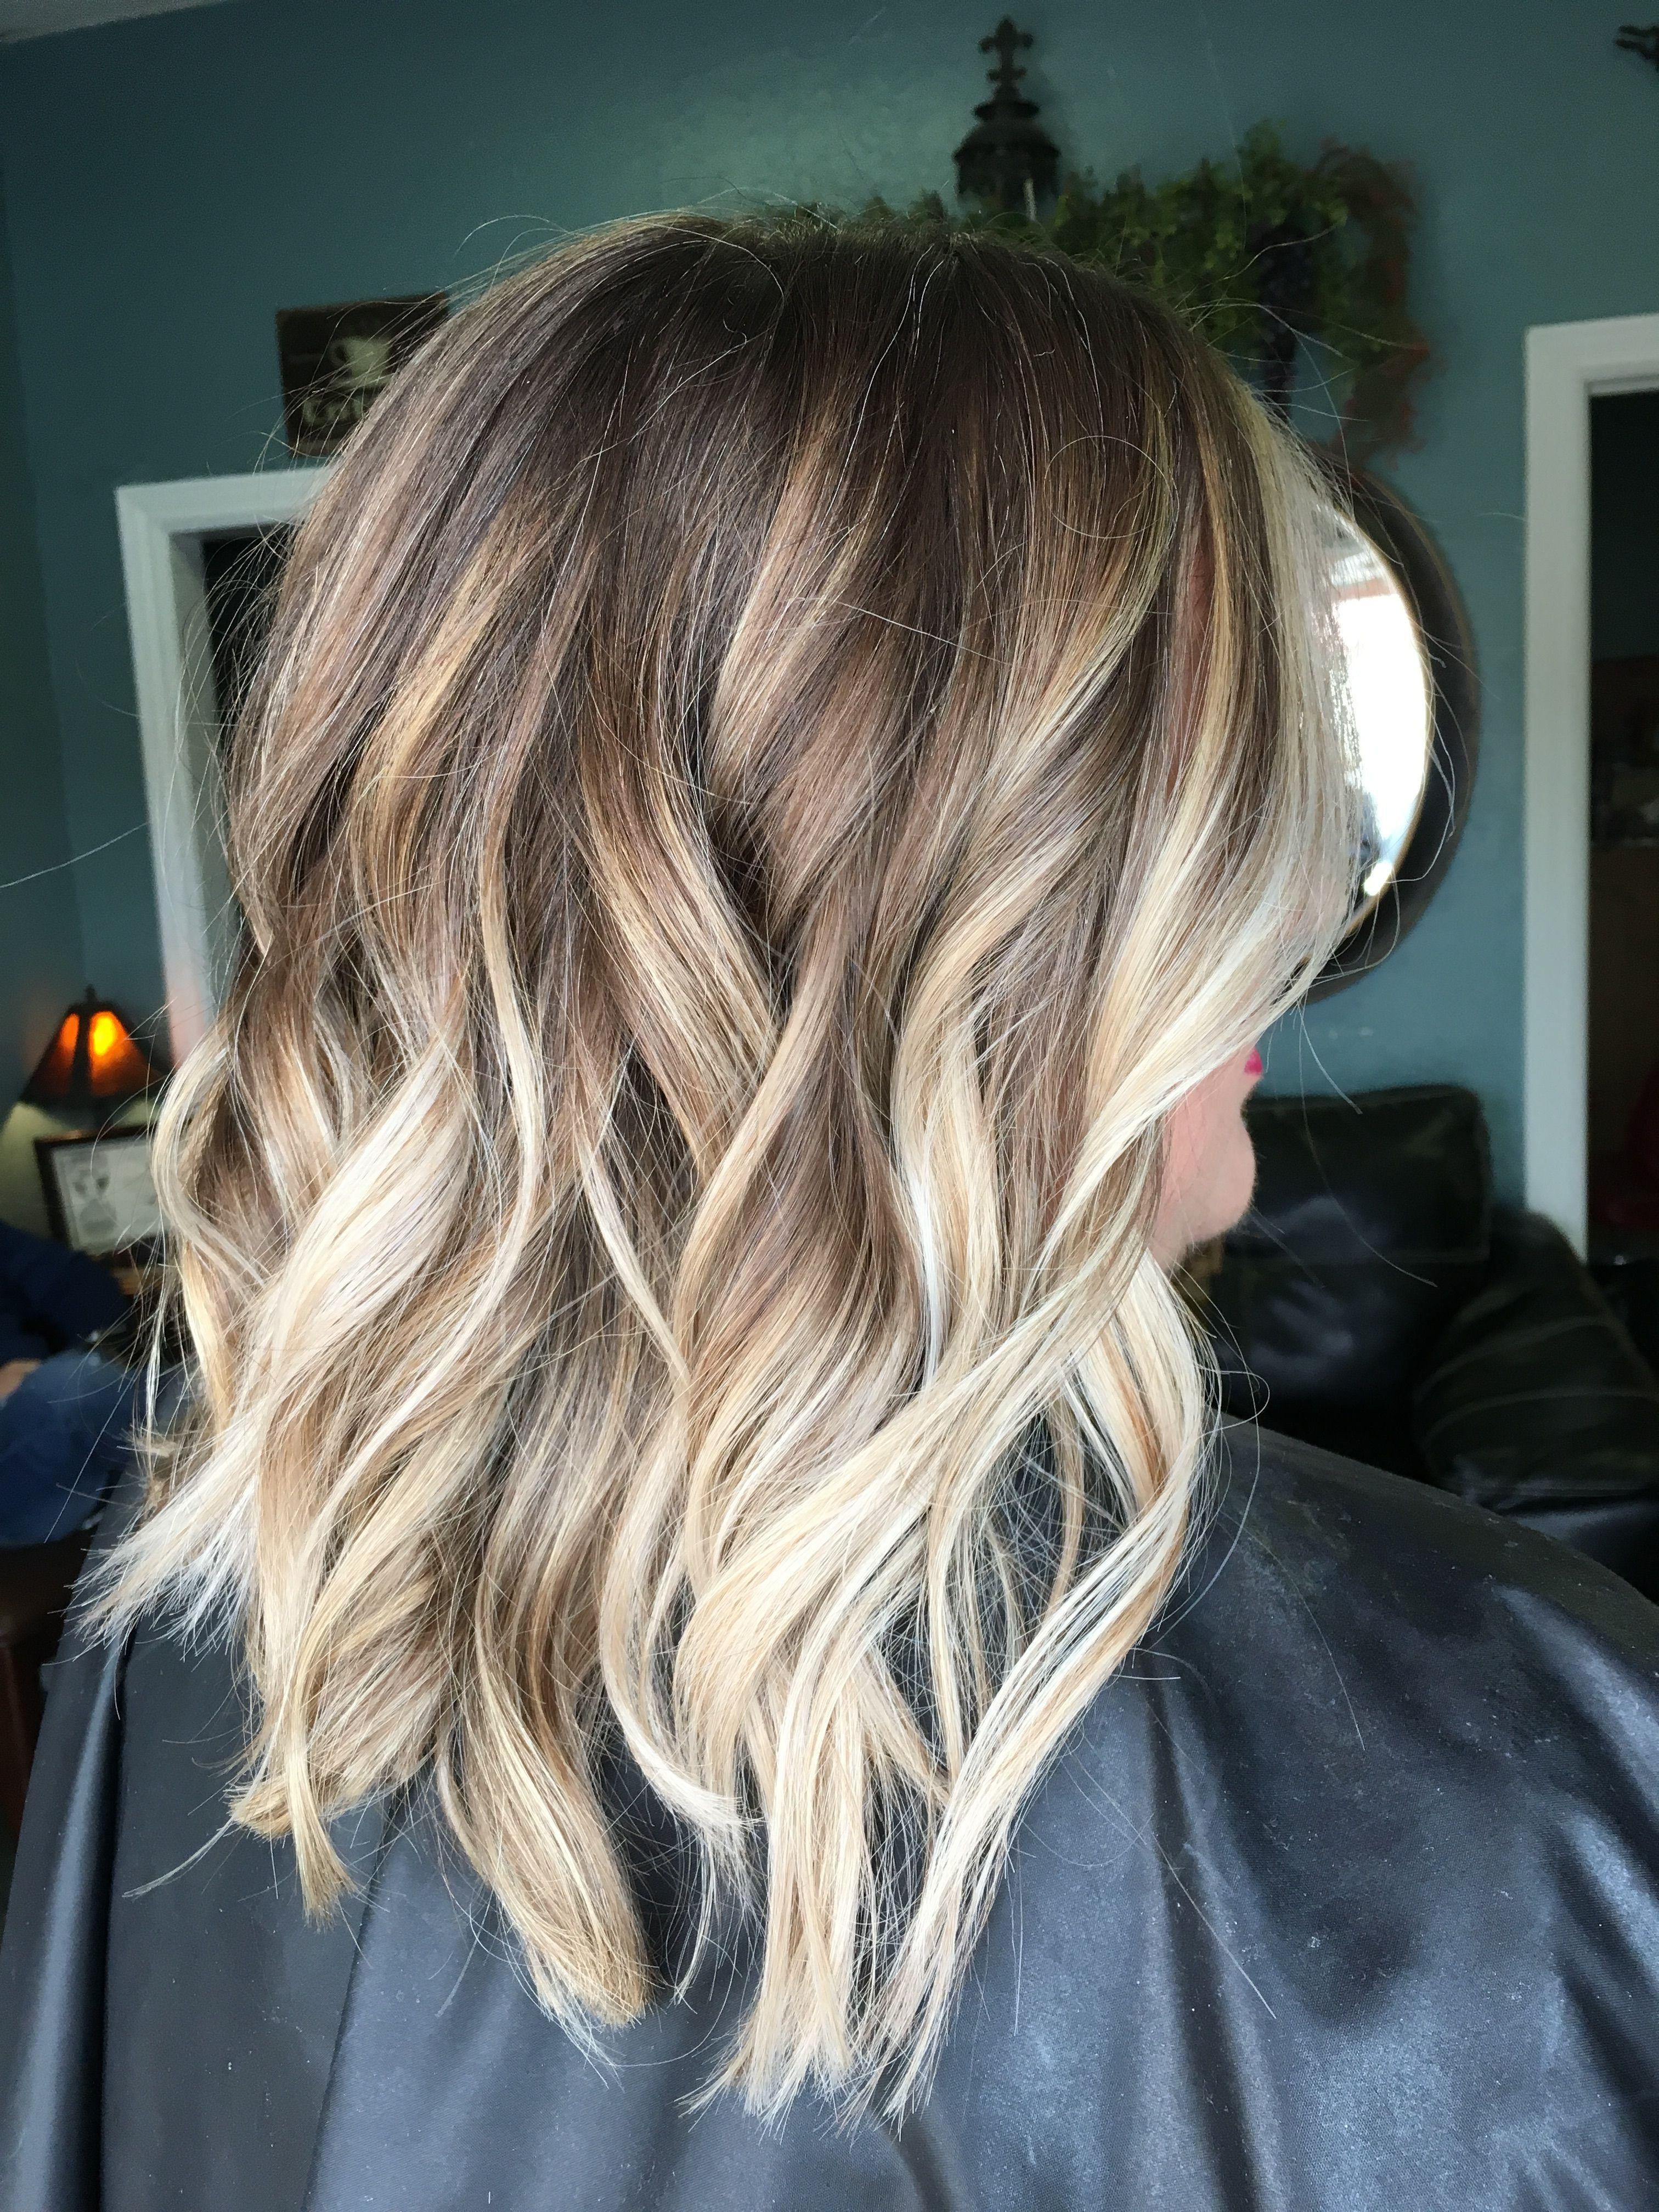 Balayage Blonde Hair Brown Hair Blonde Highlights Lob Bob Haircut Hair Loose Hair Styles Blonde Hair With Highlights Brown Hair With Blonde Highlights